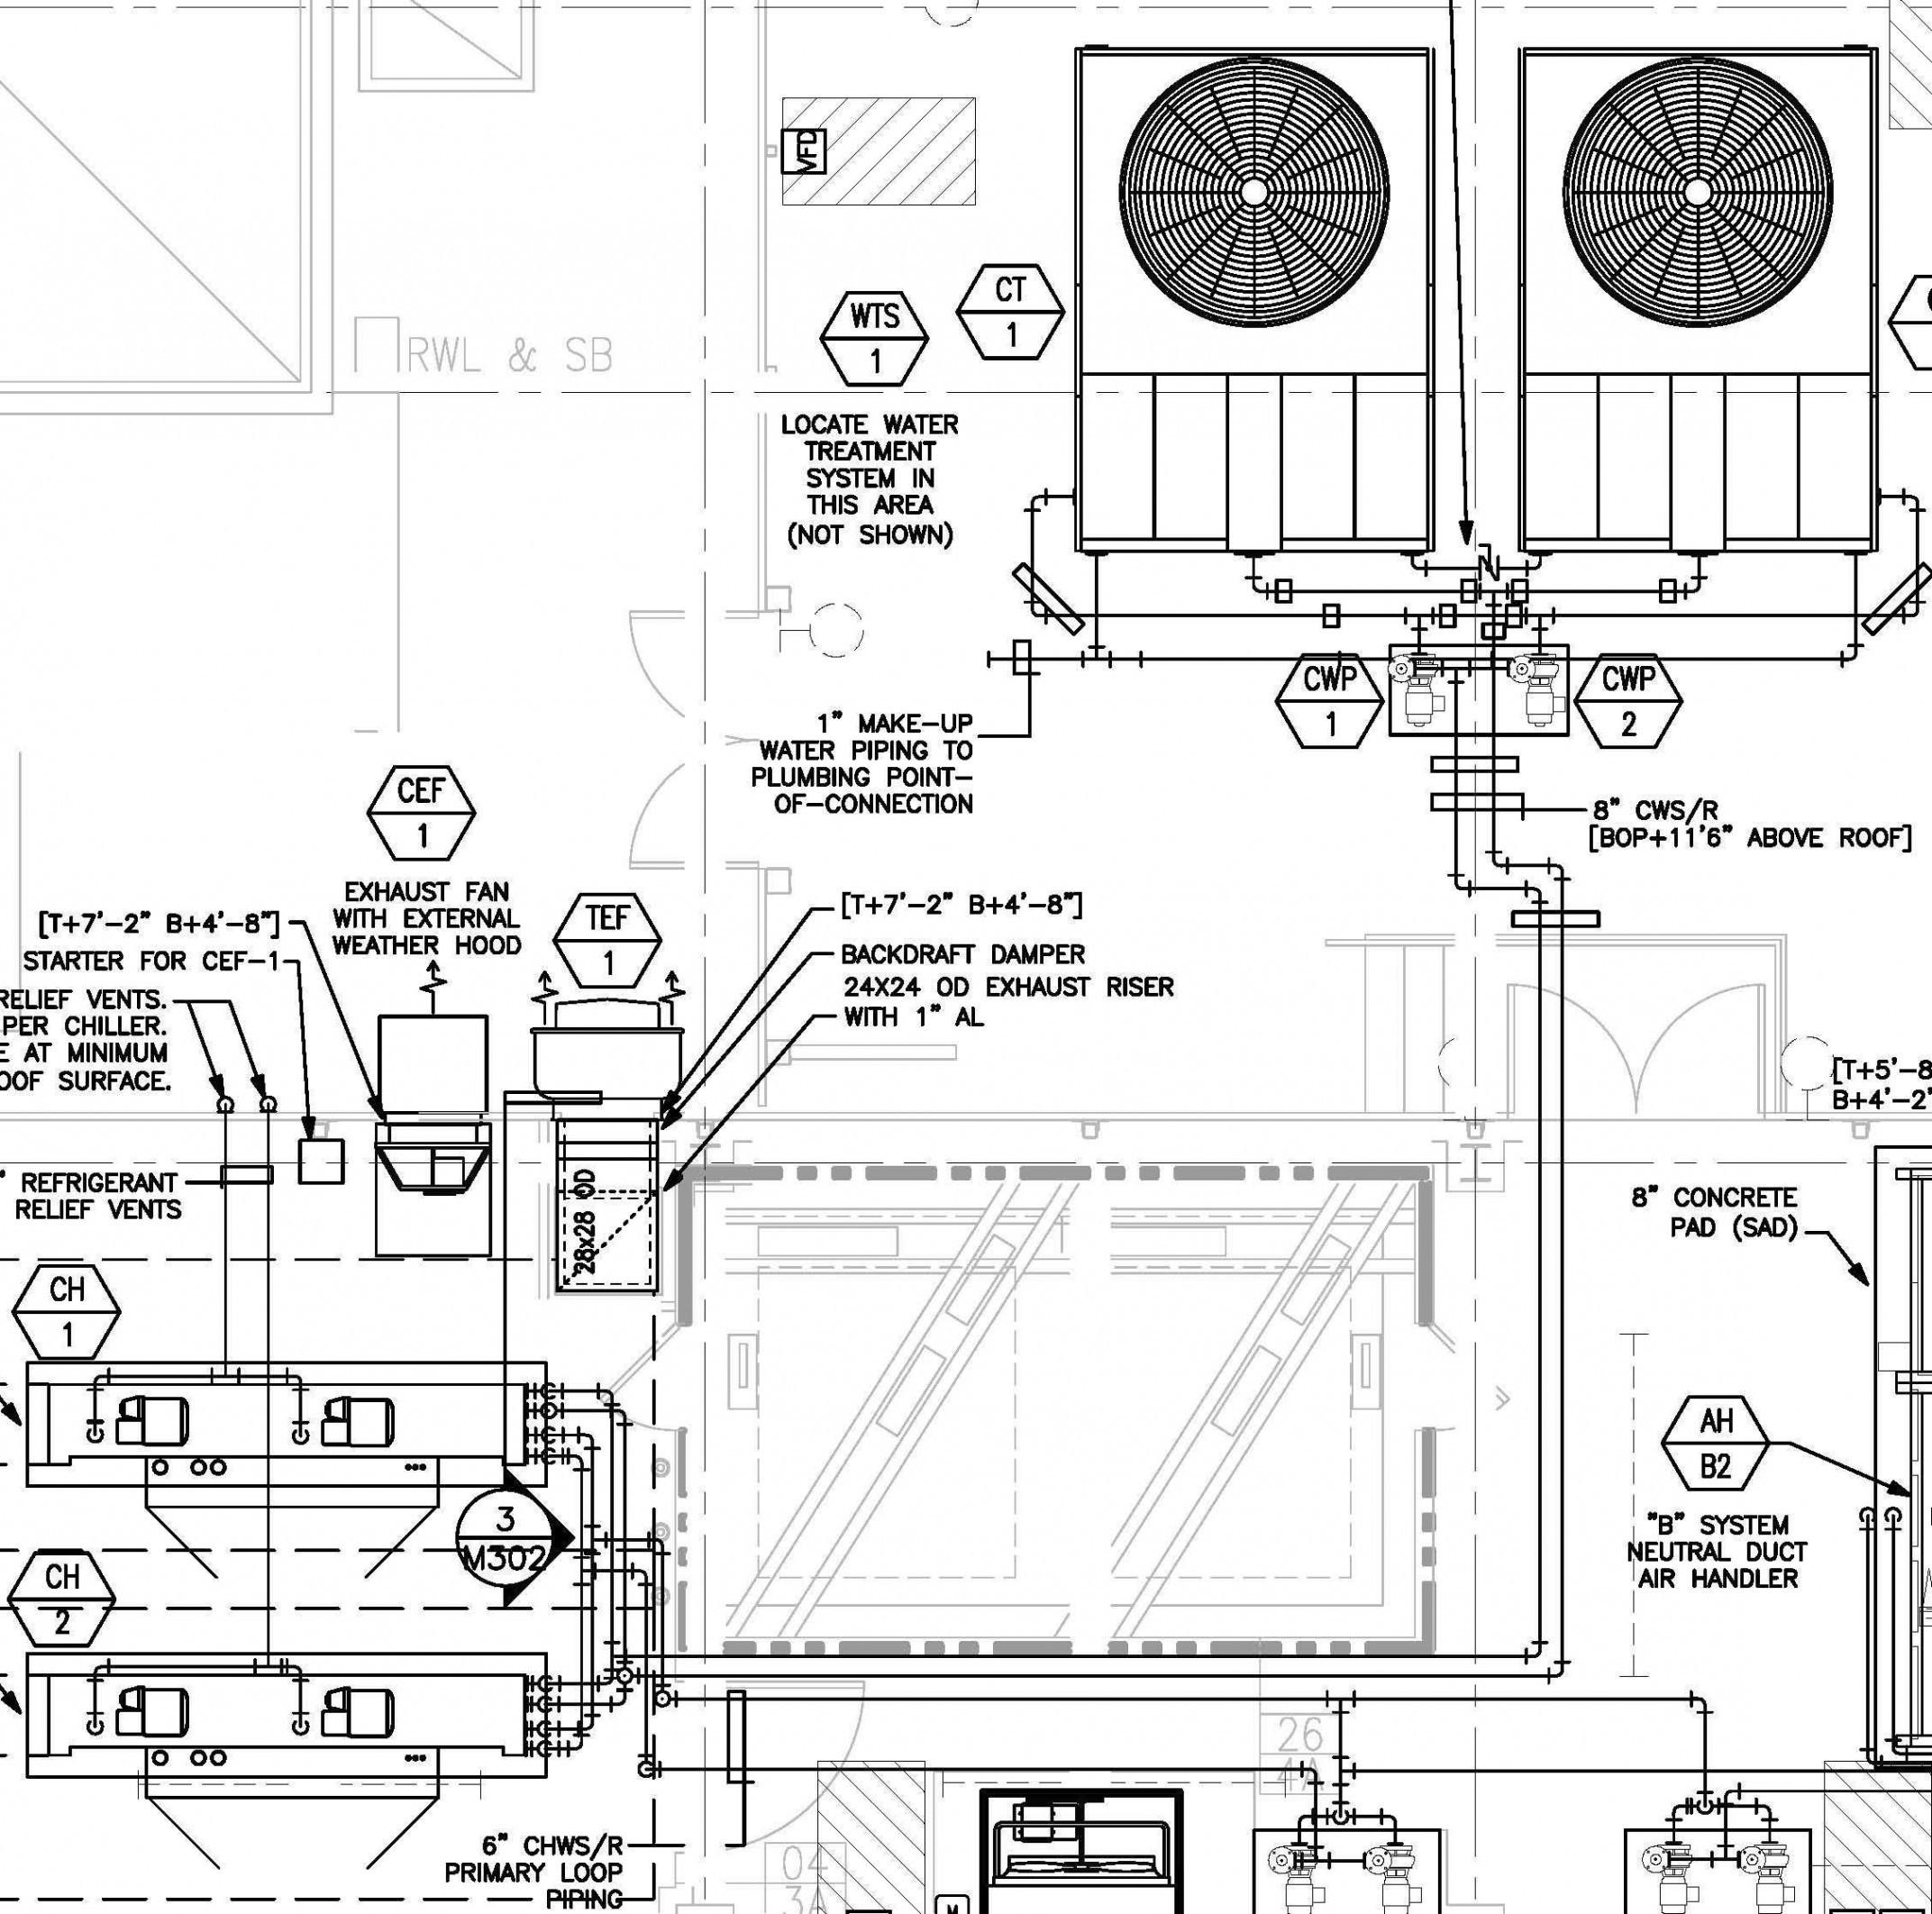 Trailer Air Brake System Diagram Air Brake System Diagram – Truck Air System Diagram Well Pump House Of Trailer Air Brake System Diagram